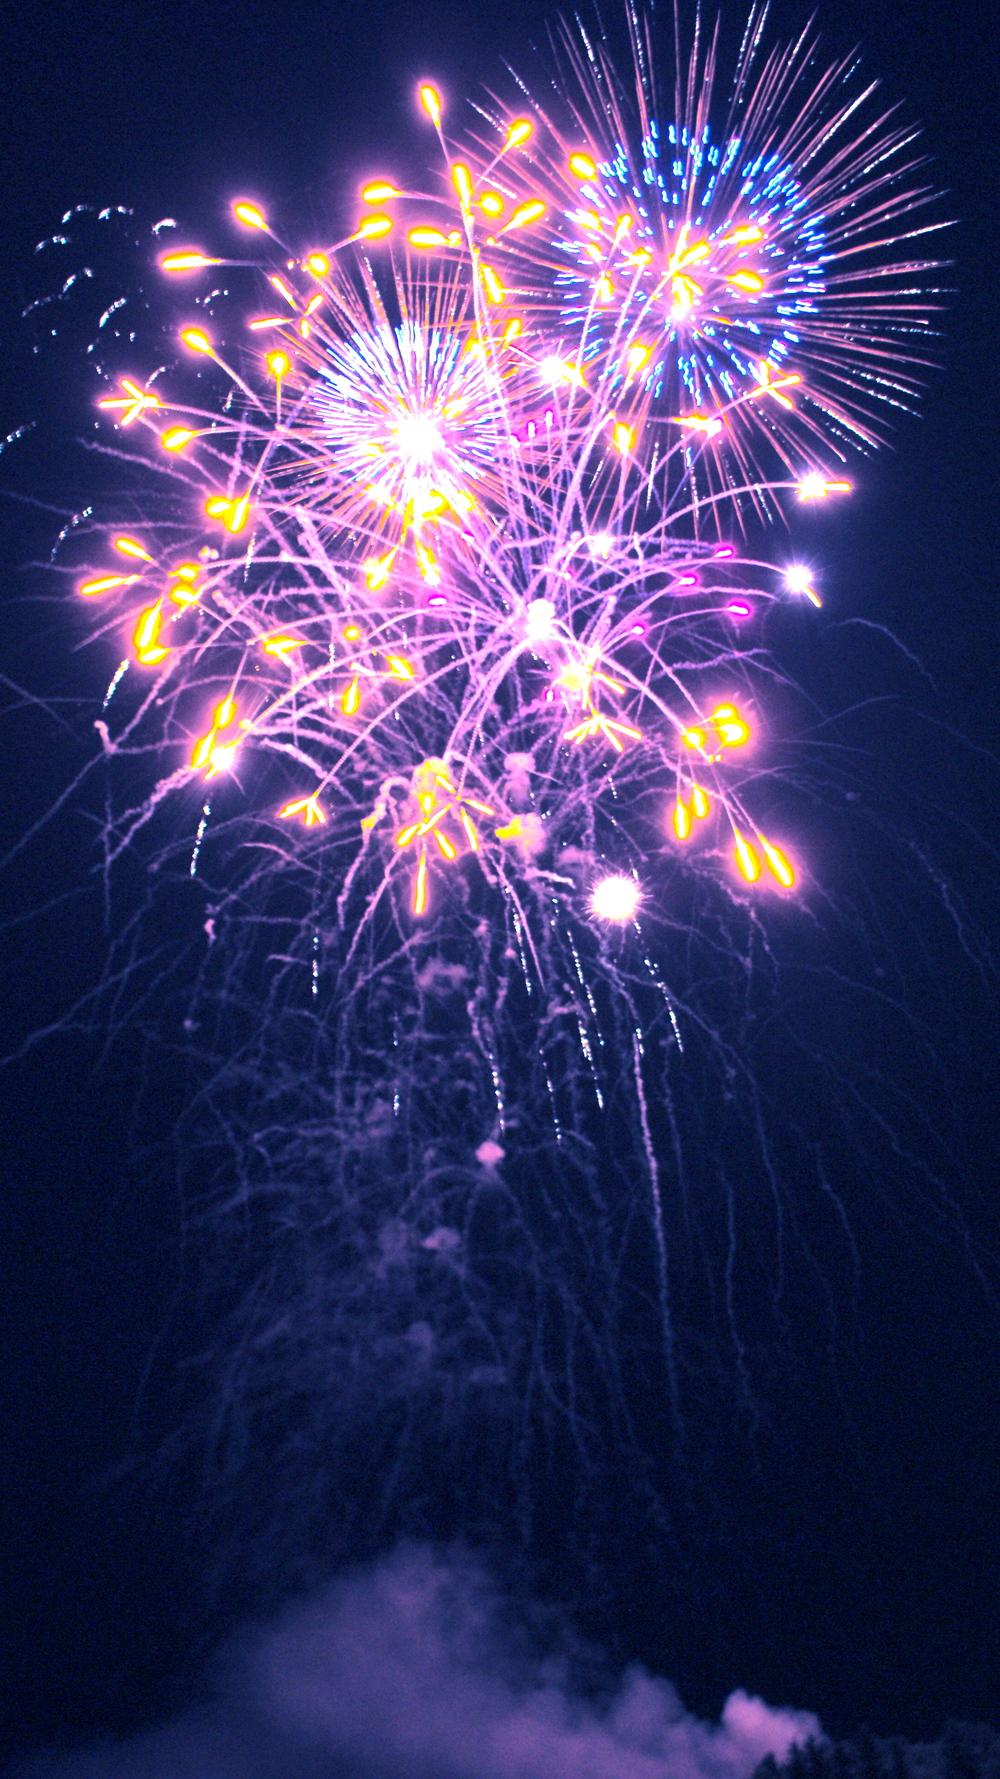 Fireworks in Kenora, Ontario, Canada Day 2012